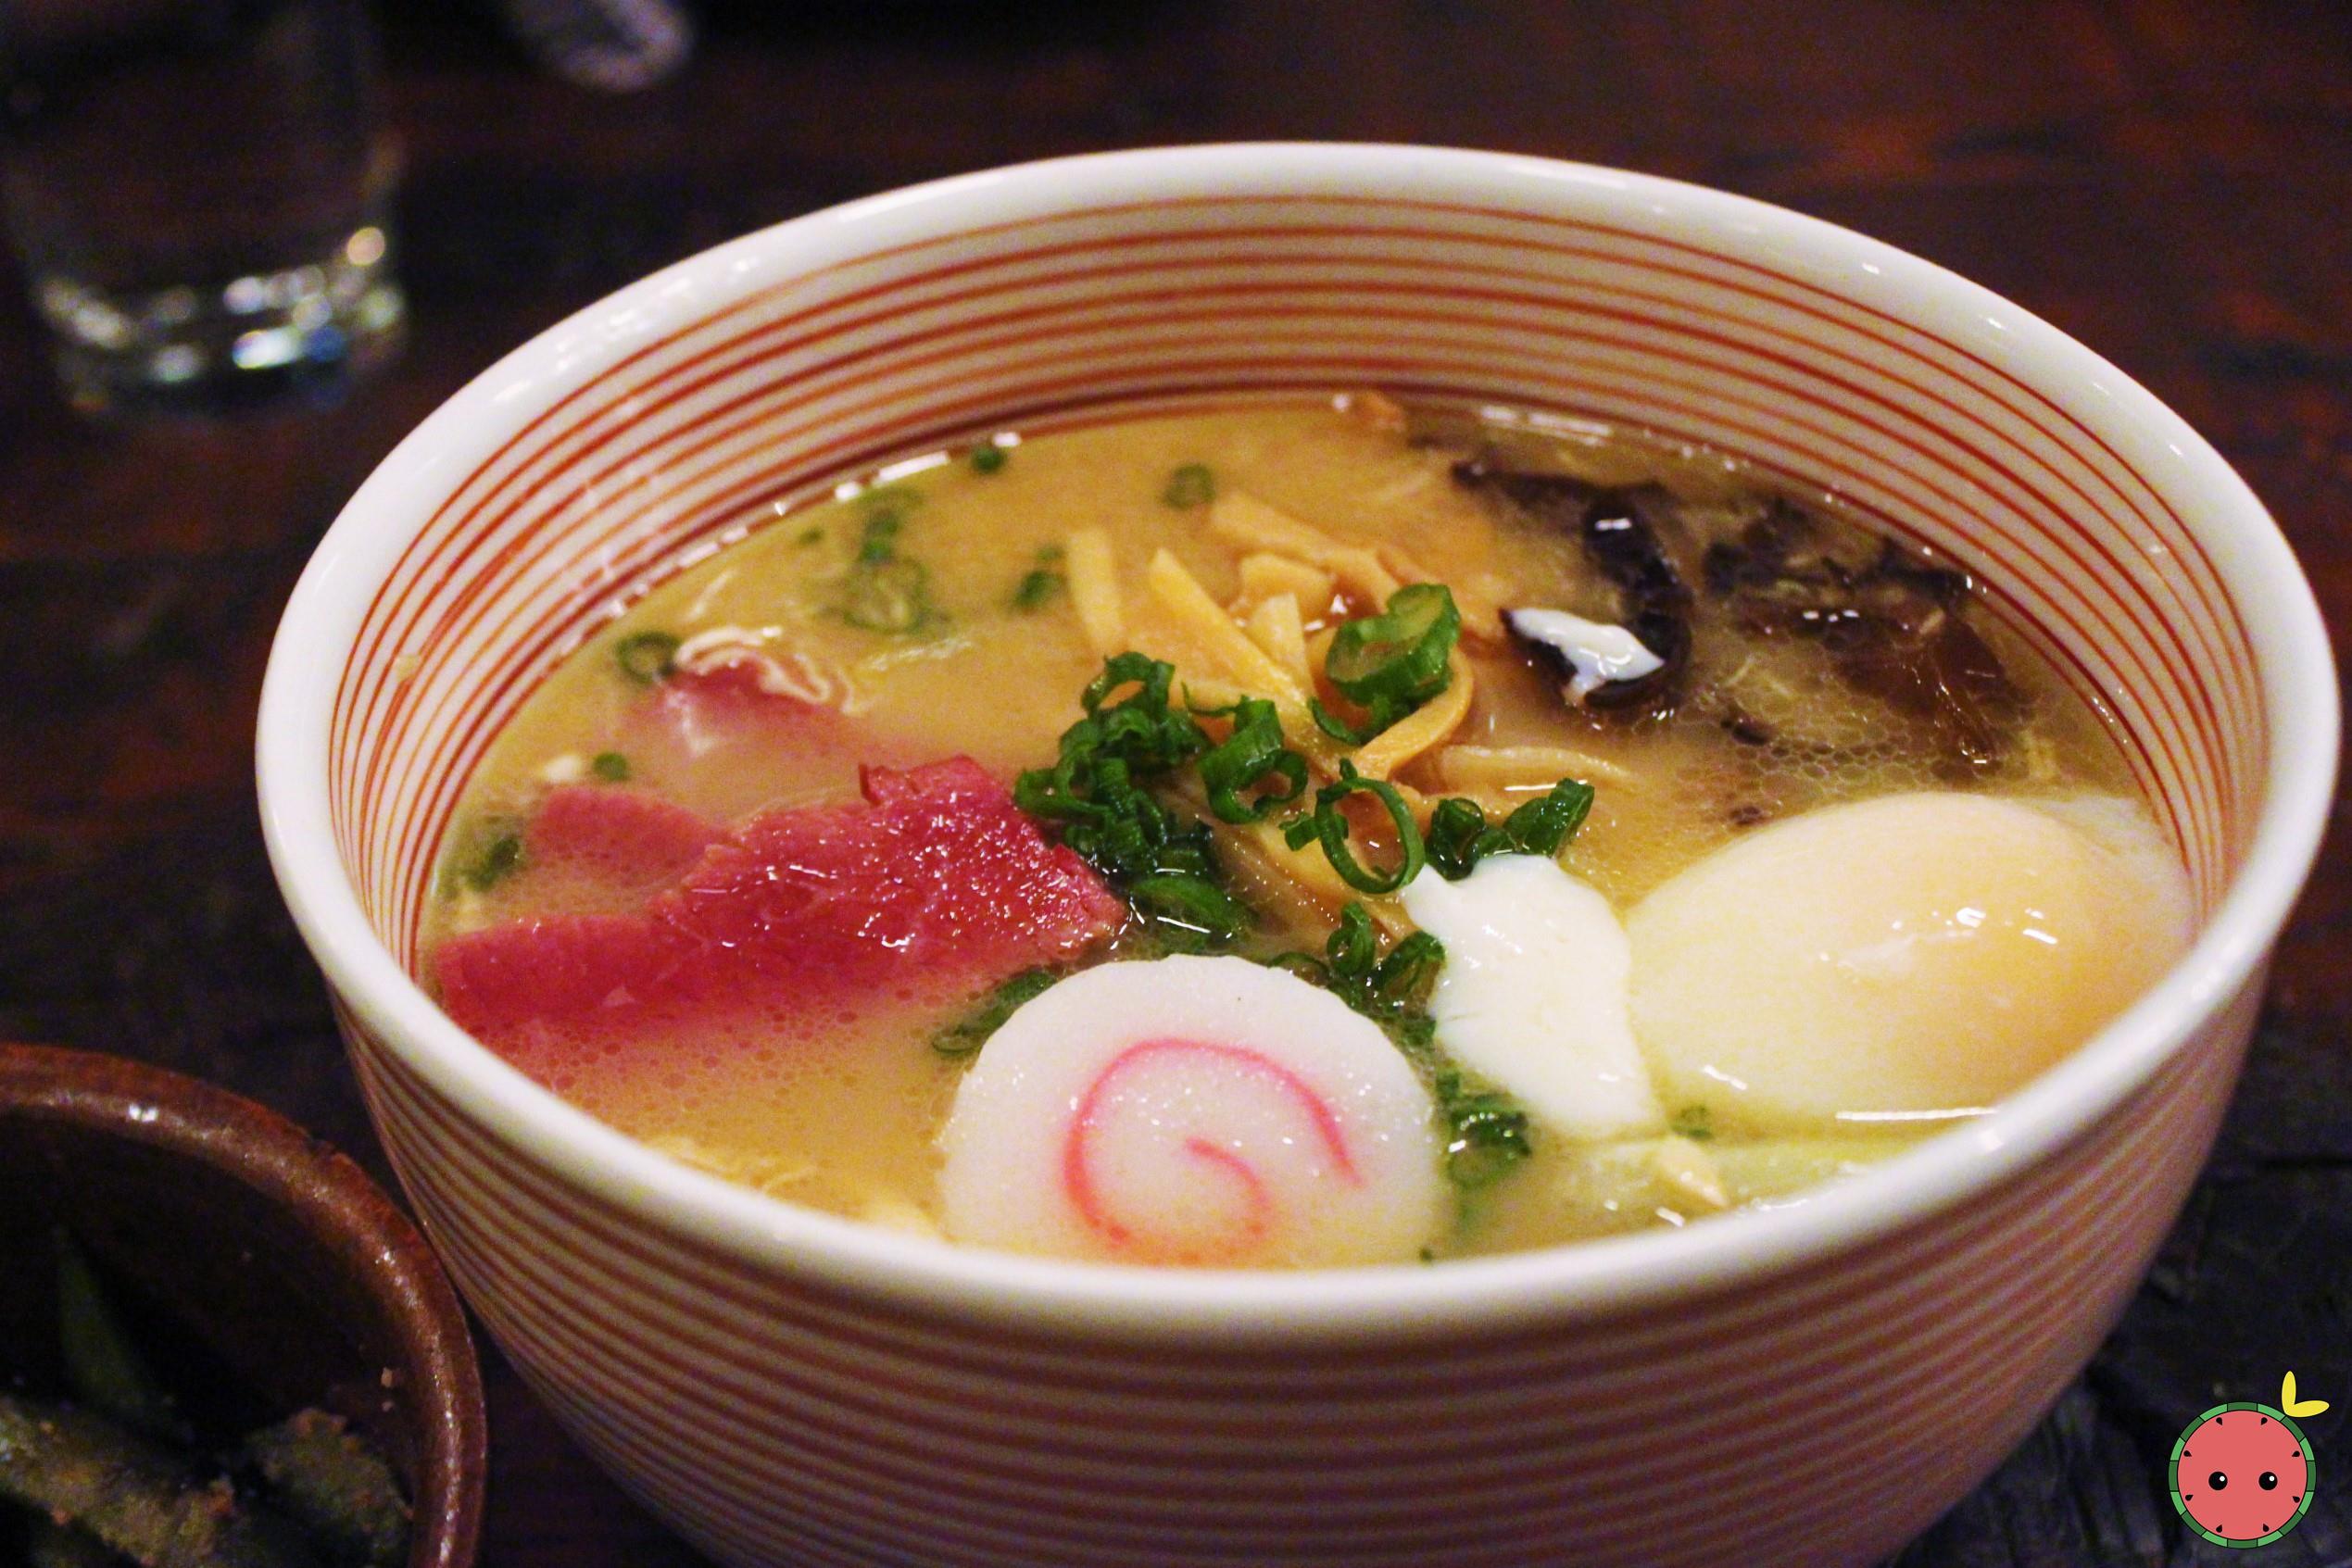 Mu Ramen - Oxtail and bone marrow based soup, corned beef